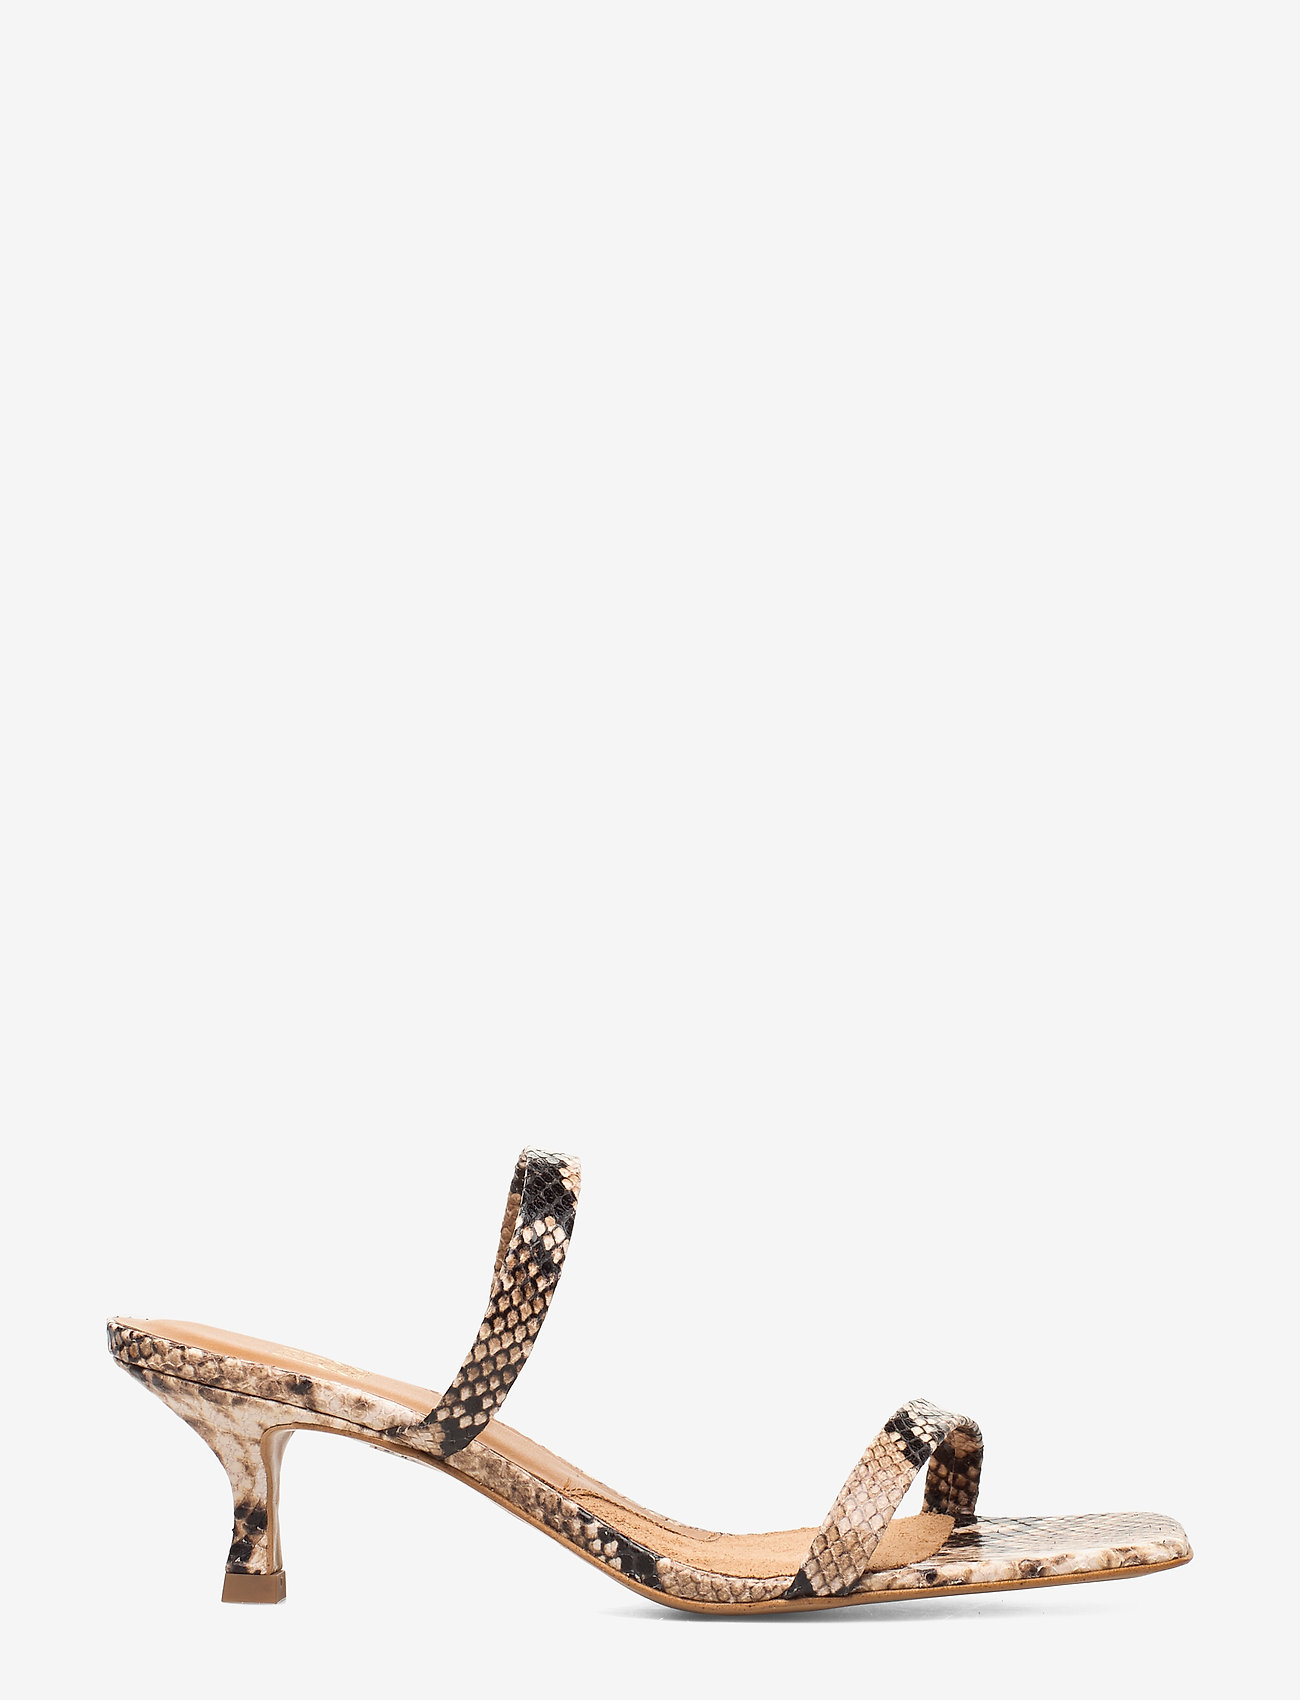 Billi Bi - Sandals 4480 - mules & slipins - beige 6071 snake 34 - 1